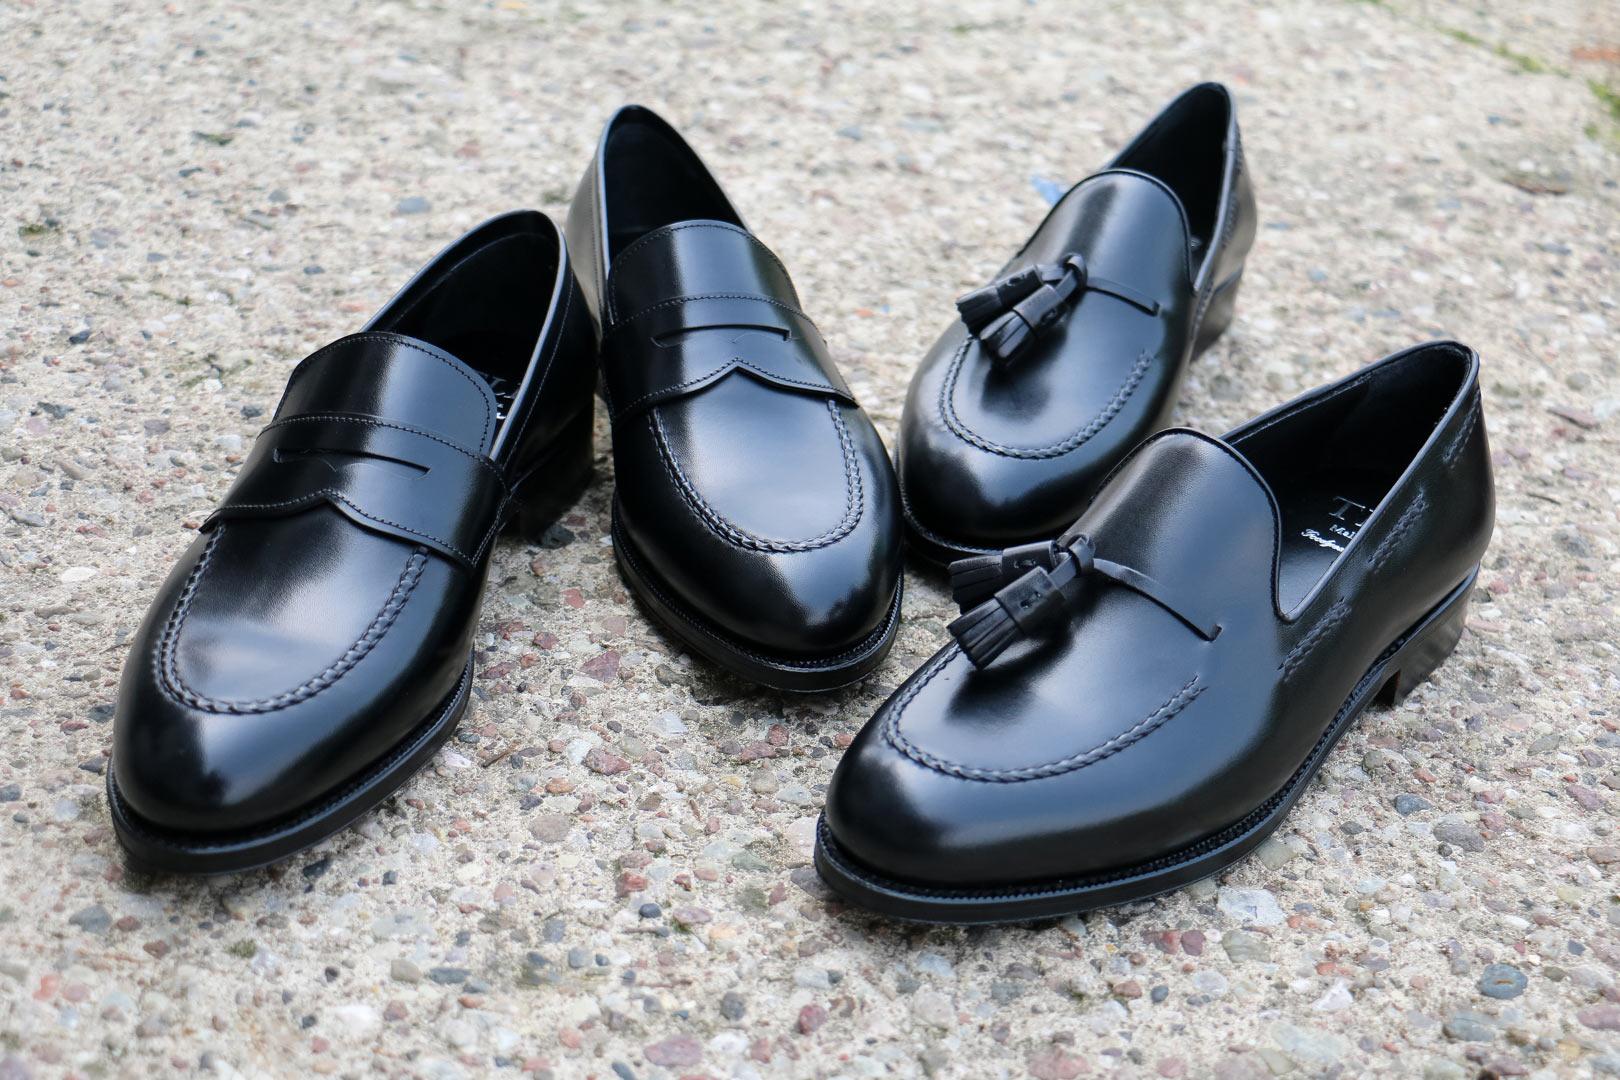 Loafersy z czarnej skóry. penny i tassel, mokasyny obuwie męskie.